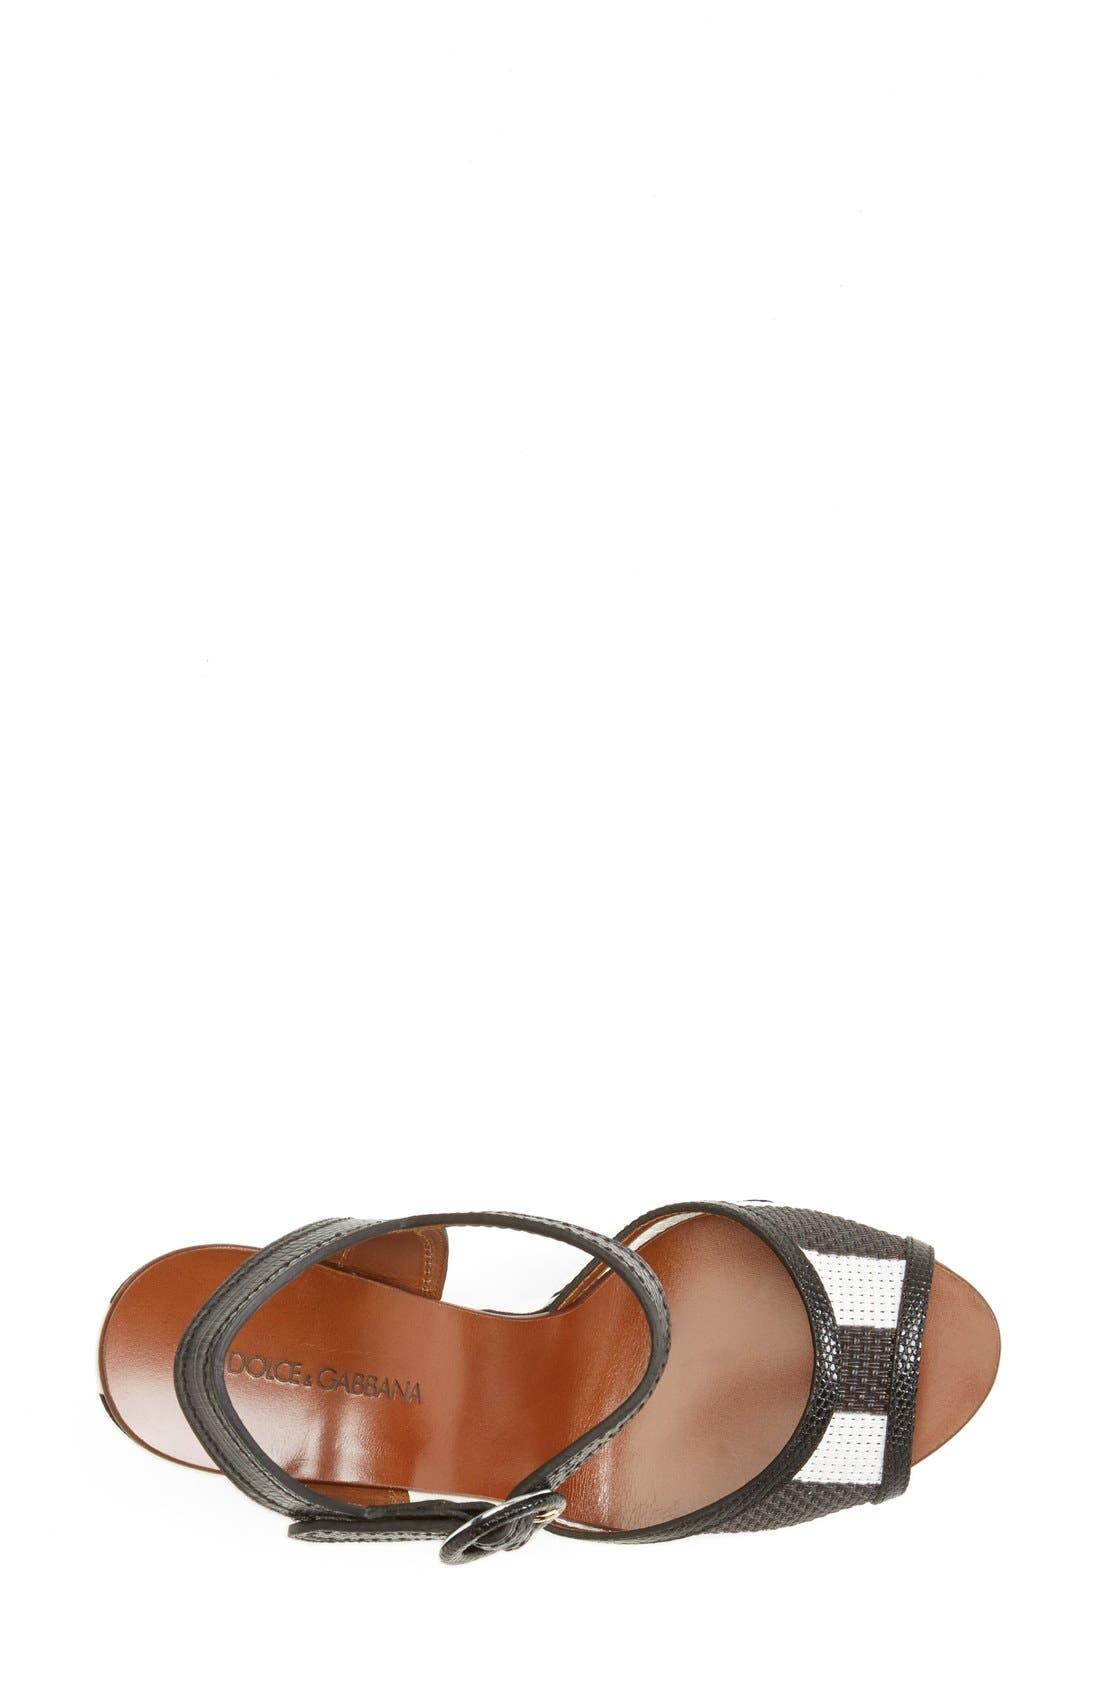 Alternate Image 3  - Dolce&Gabbana Stripe Platform Wedge Sandal (Women)